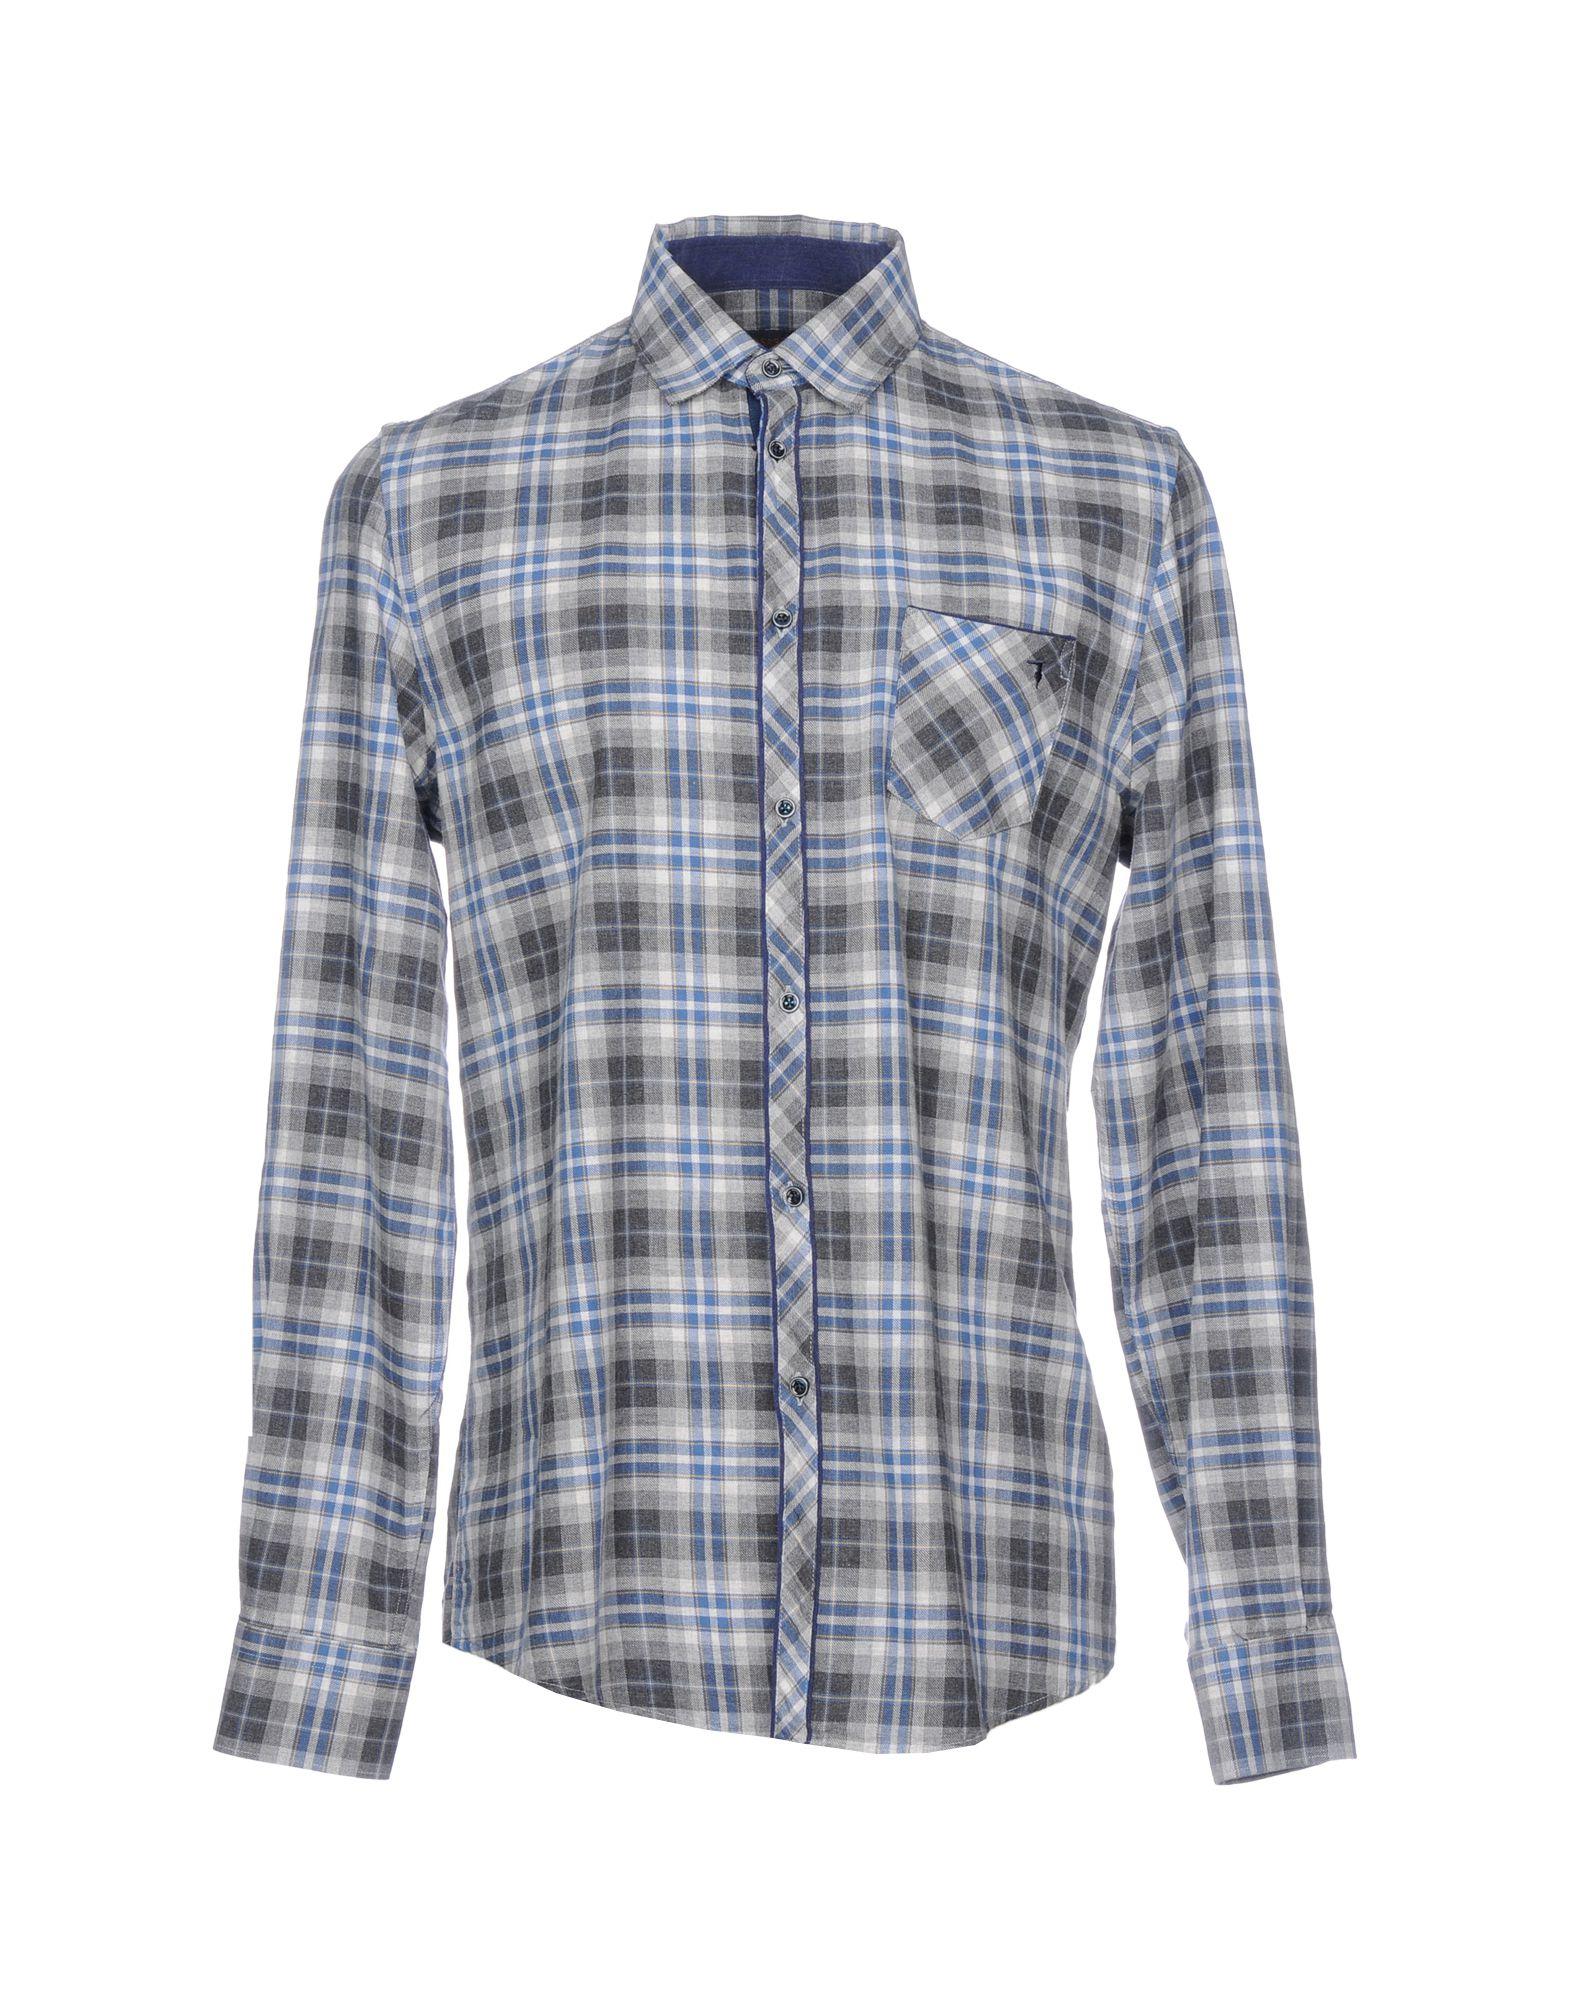 TRUSSARDI JEANS Pубашка trussardi jeans trussardi jeans 56a49 49 61